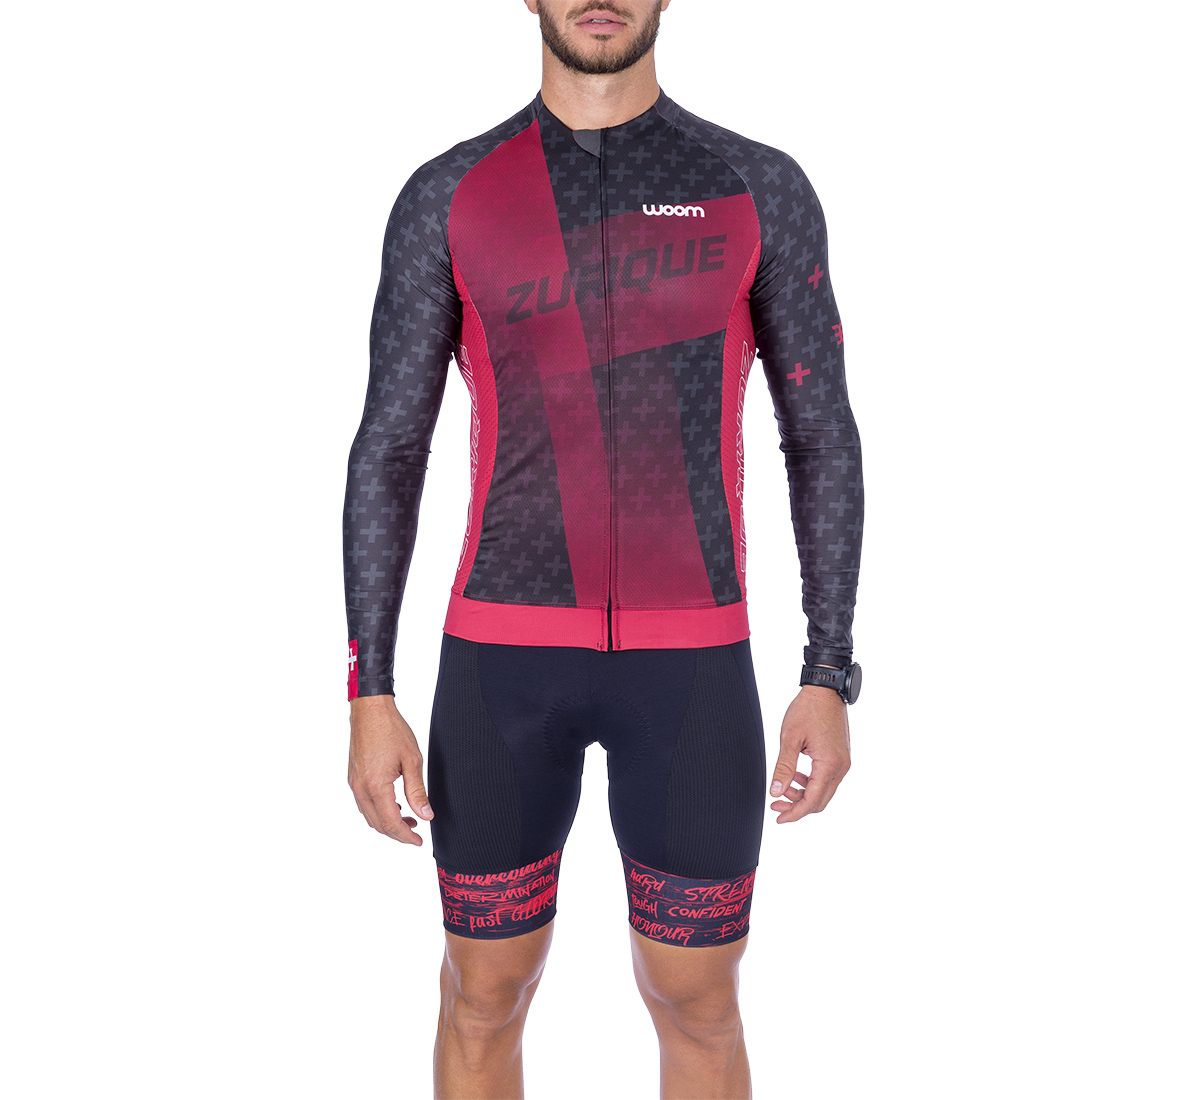 Camisa Ciclismo ML Supreme Zurique Masculina